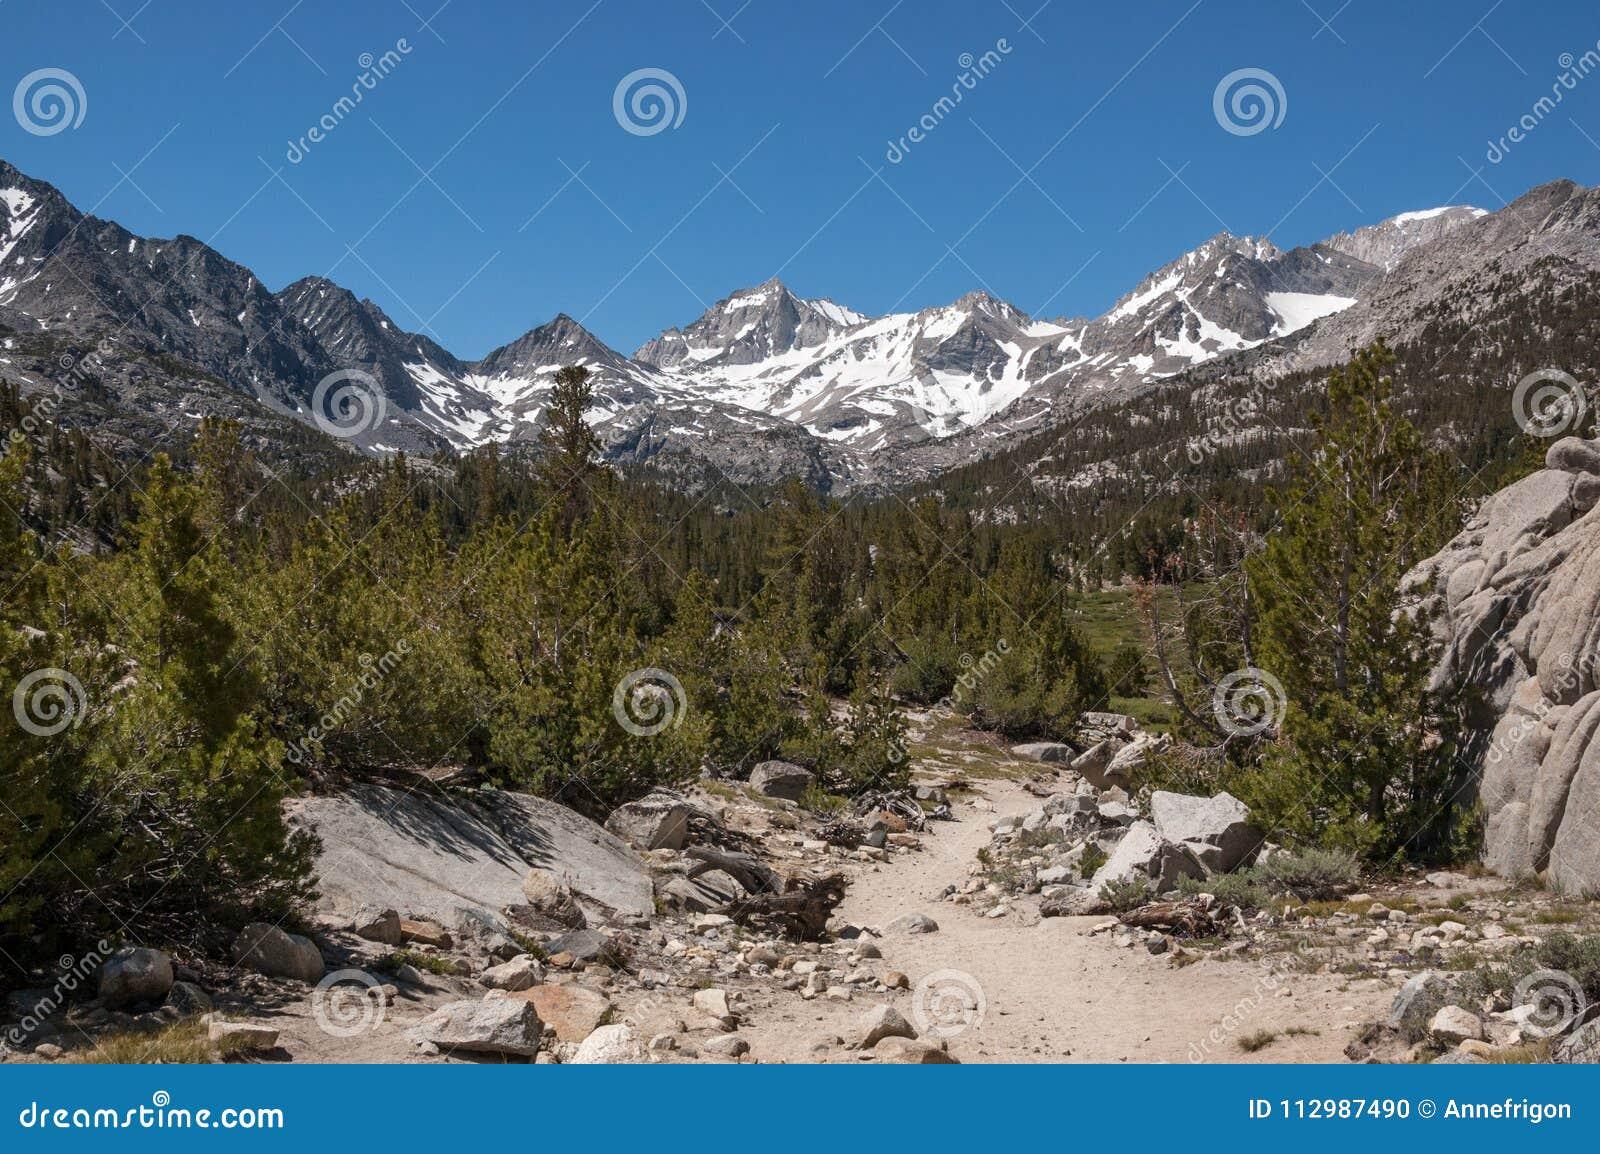 Trail to Mono Pass, Eastern Sierras, California